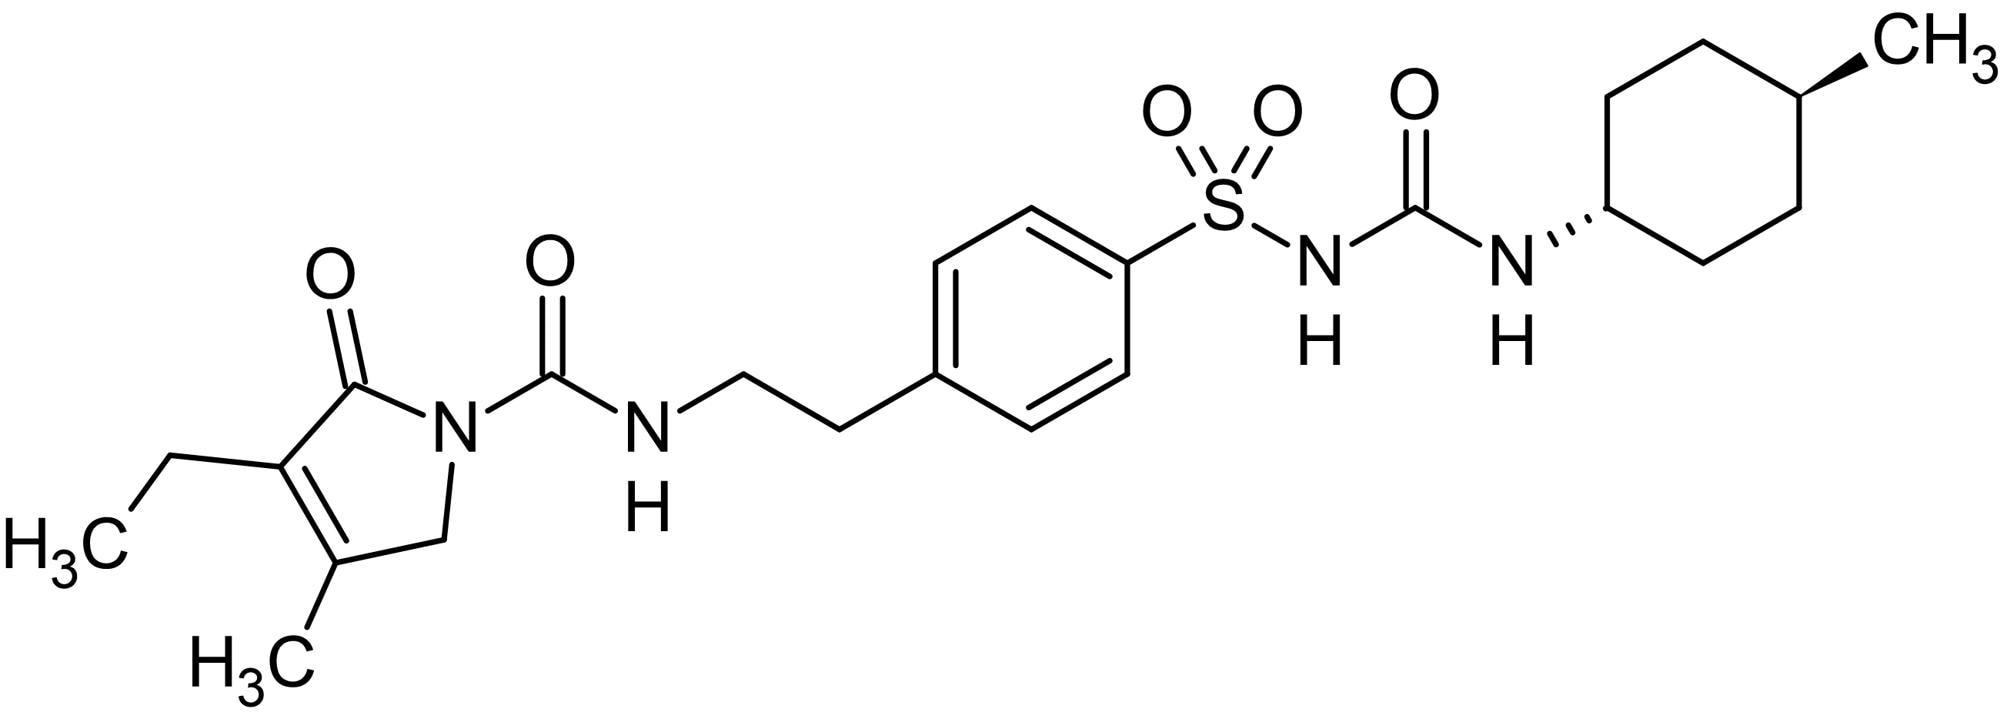 Chemical Structure - Glimepiride, cardiac K<sub>ATP</sub> channel blocker (ab142301)